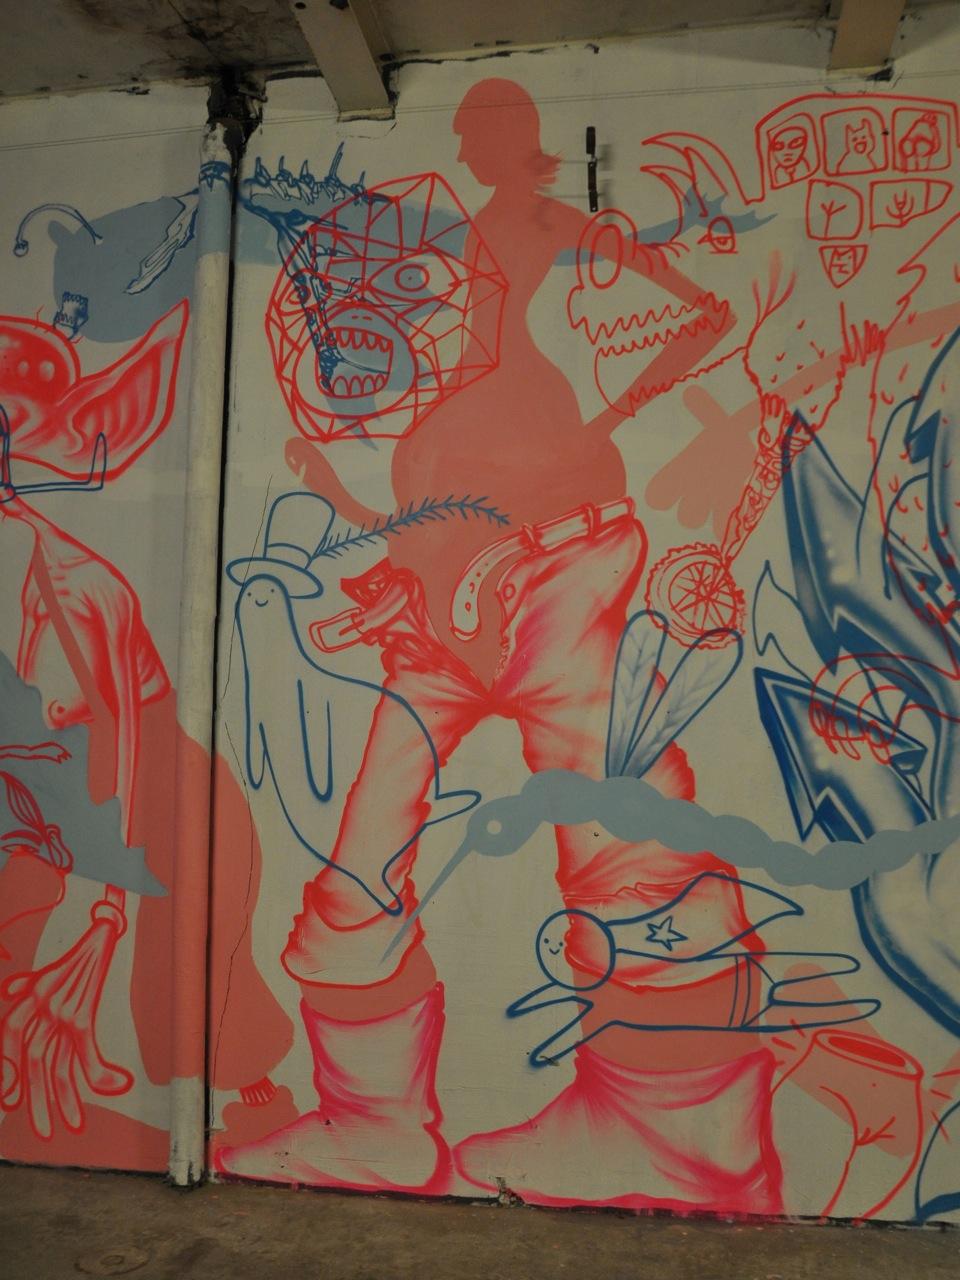 260-2011-david-choe-dvs1-street-art-nuart-festival-21.jpg